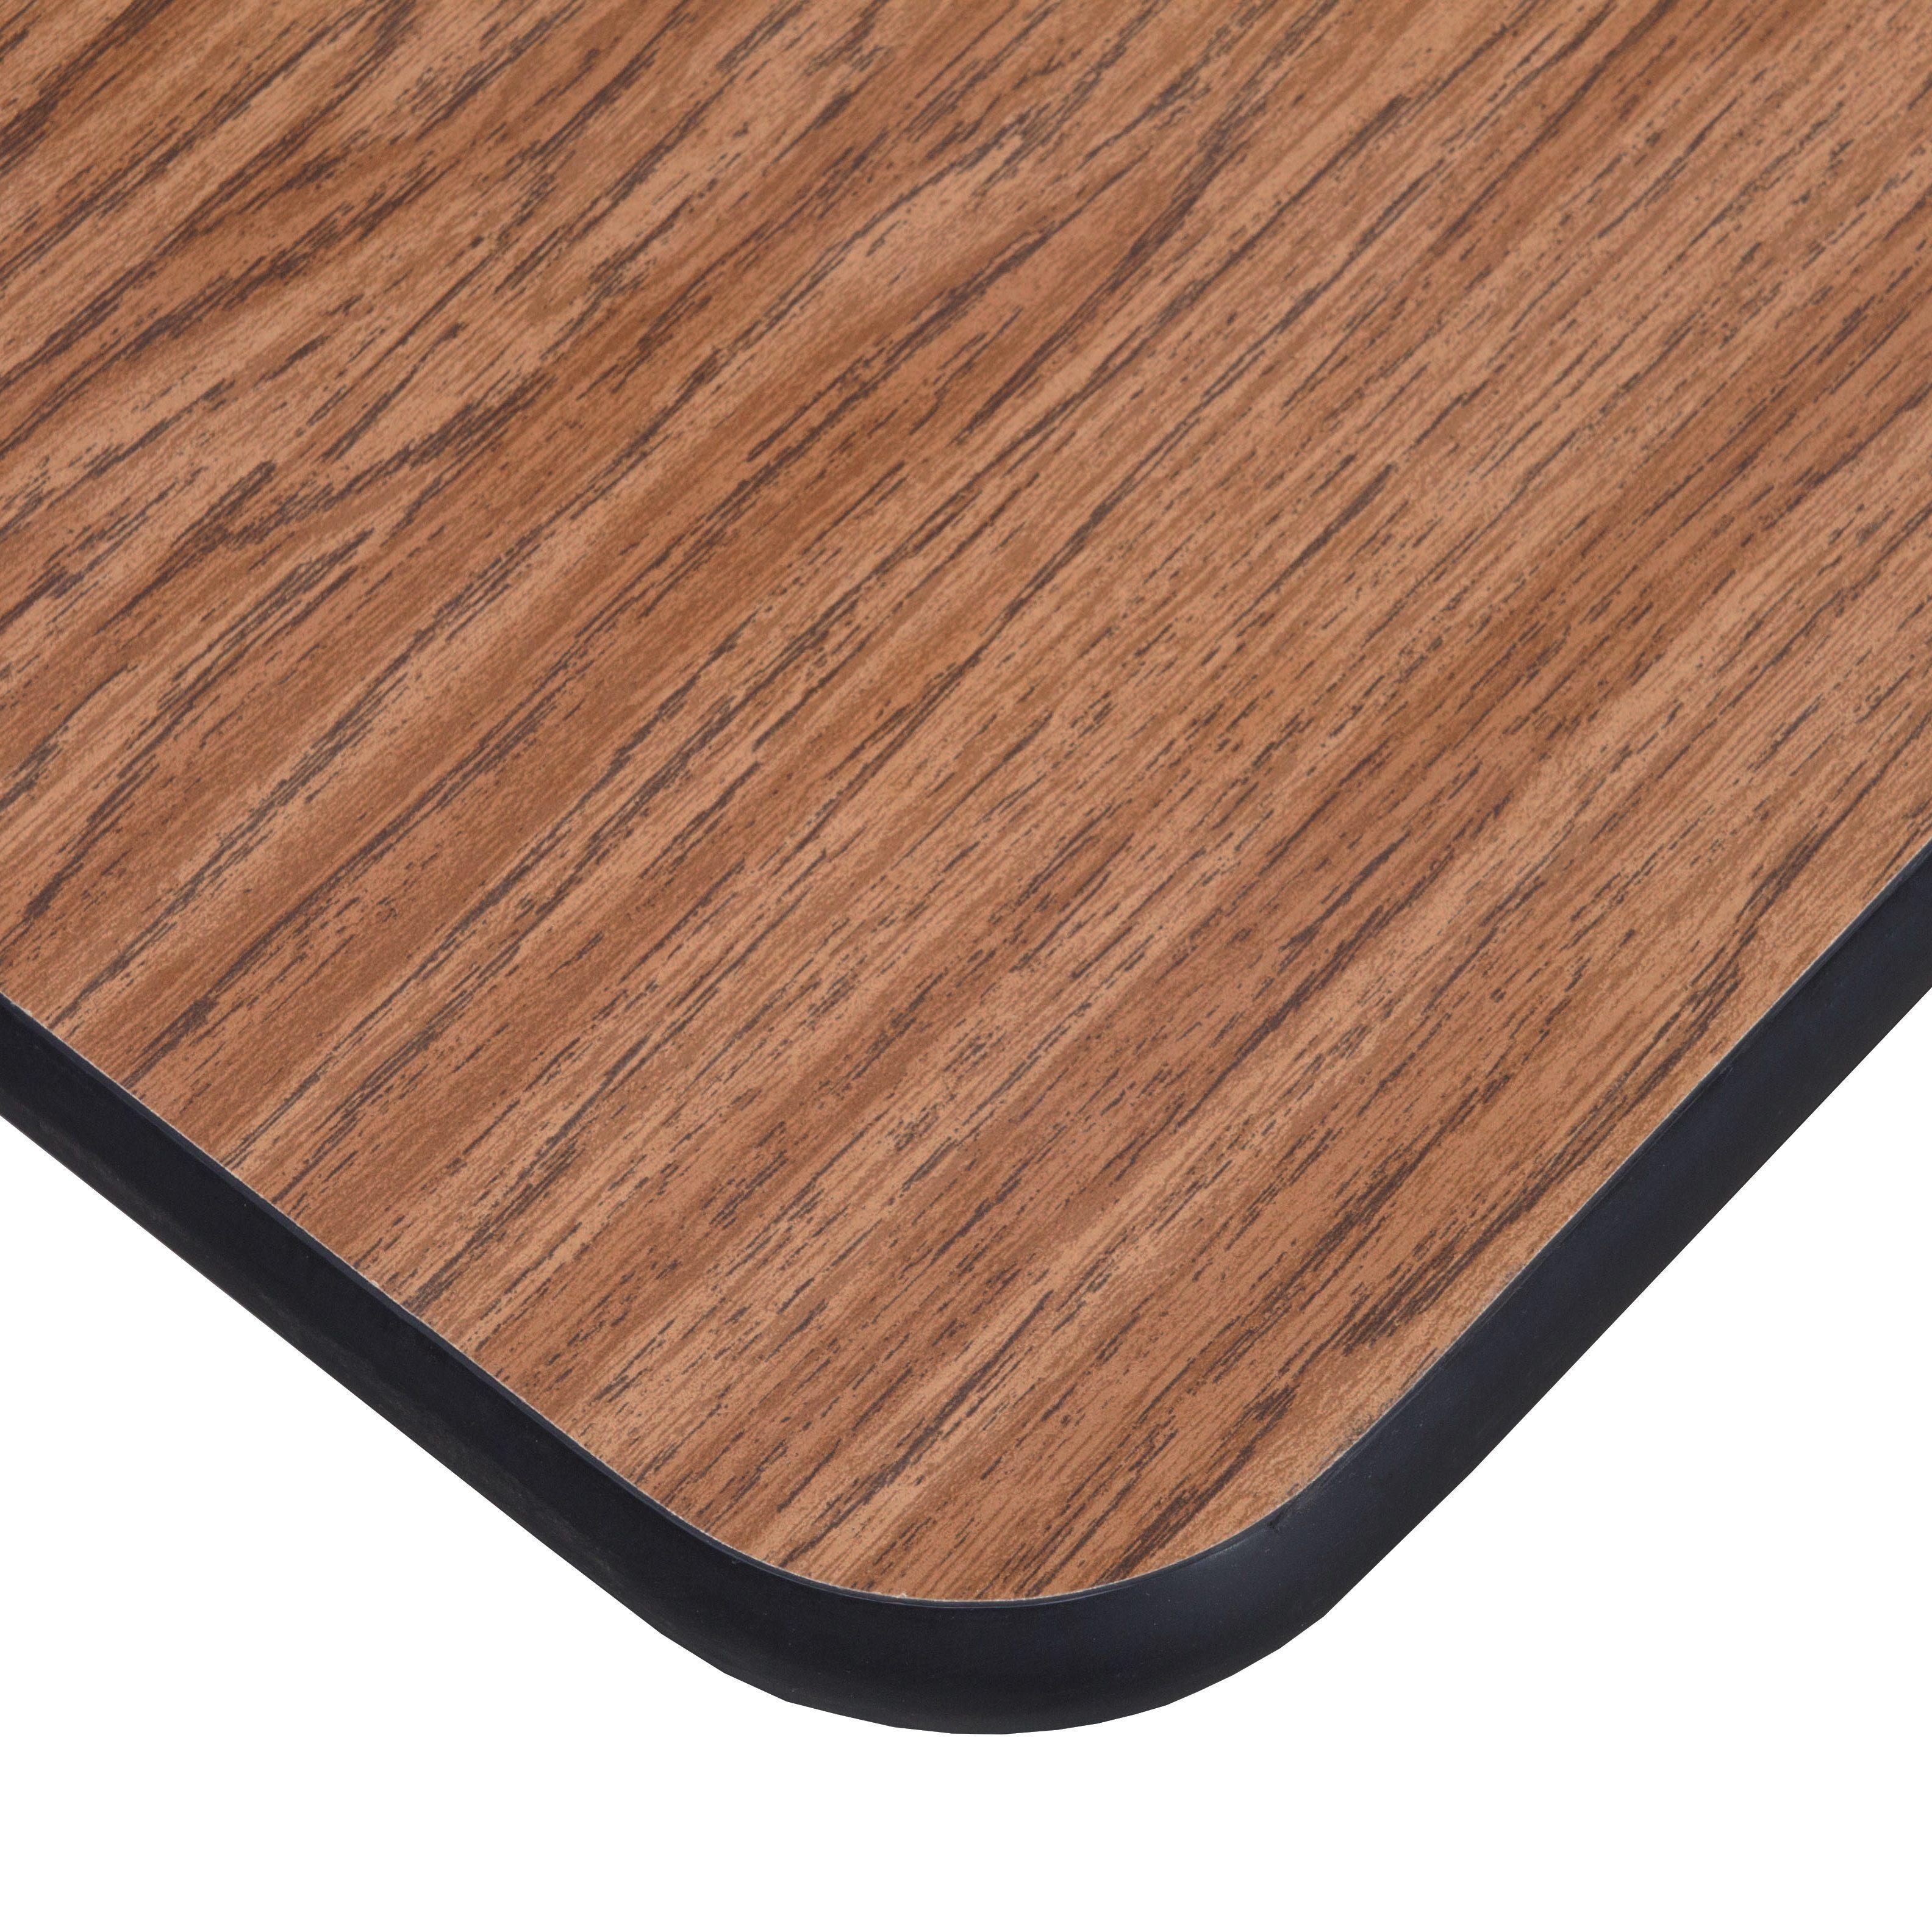 Walnut-School Table-24x60-02